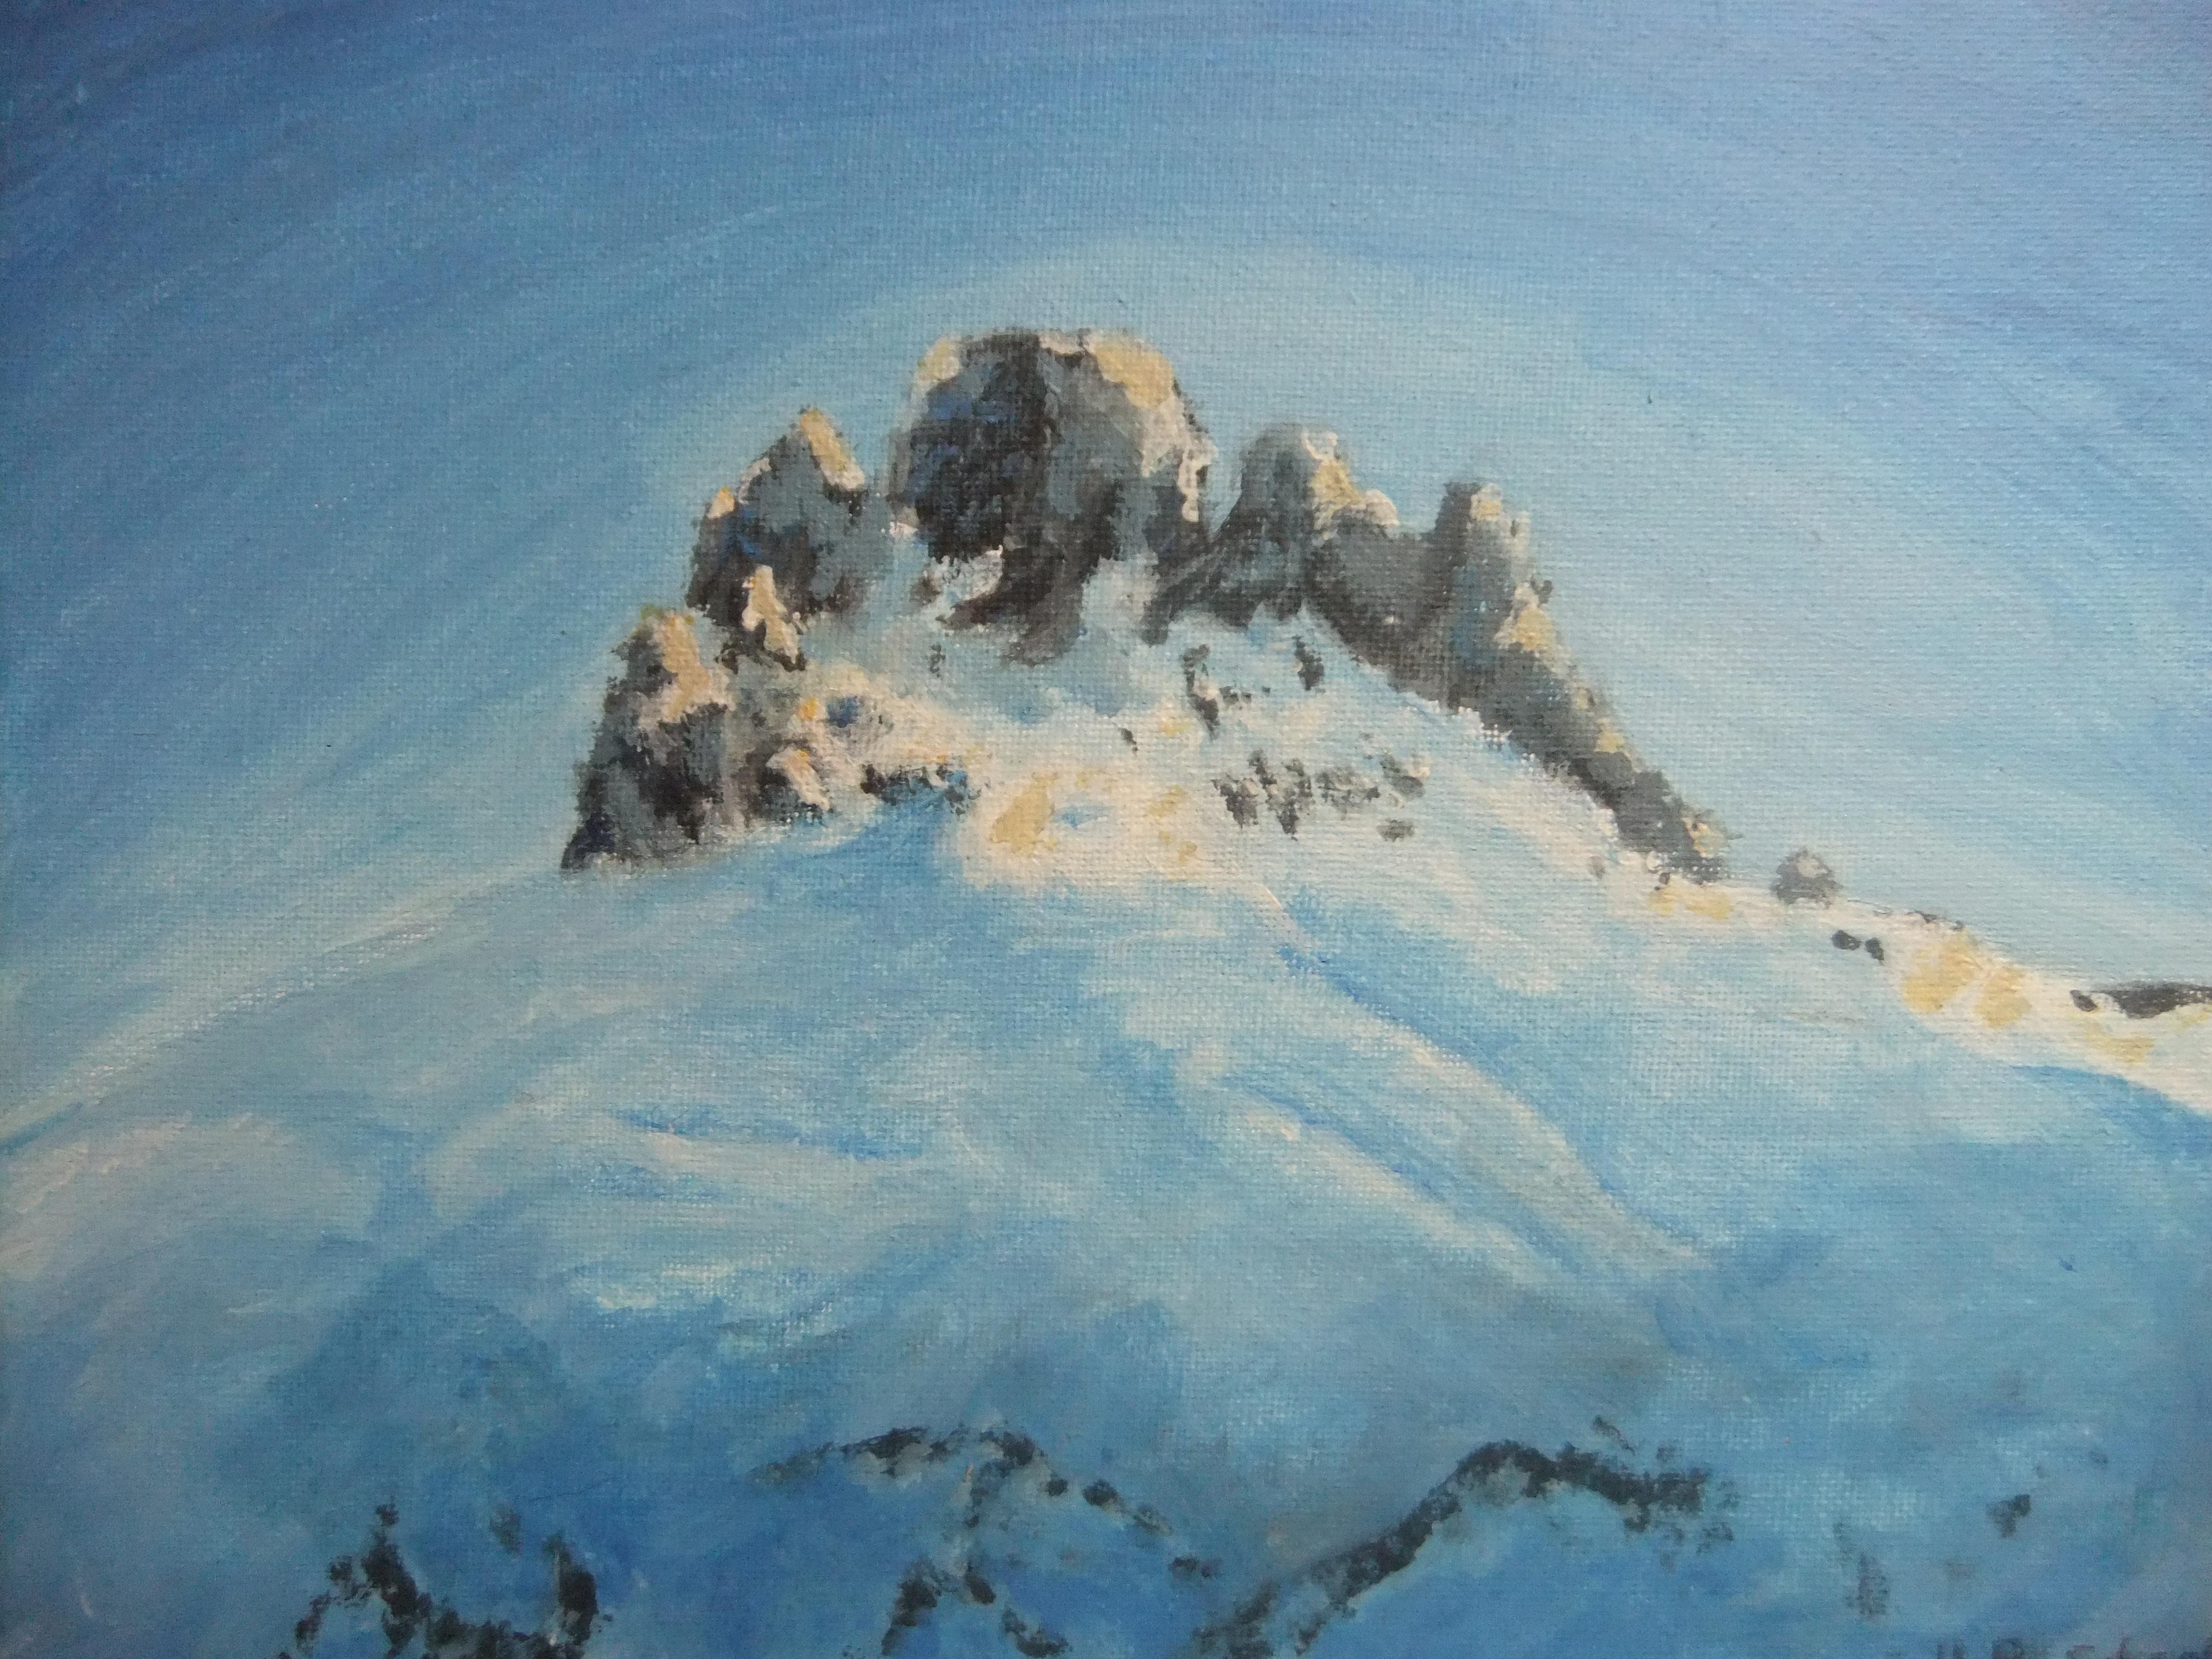 the Tschingellochtighorn - a beautiful mountain